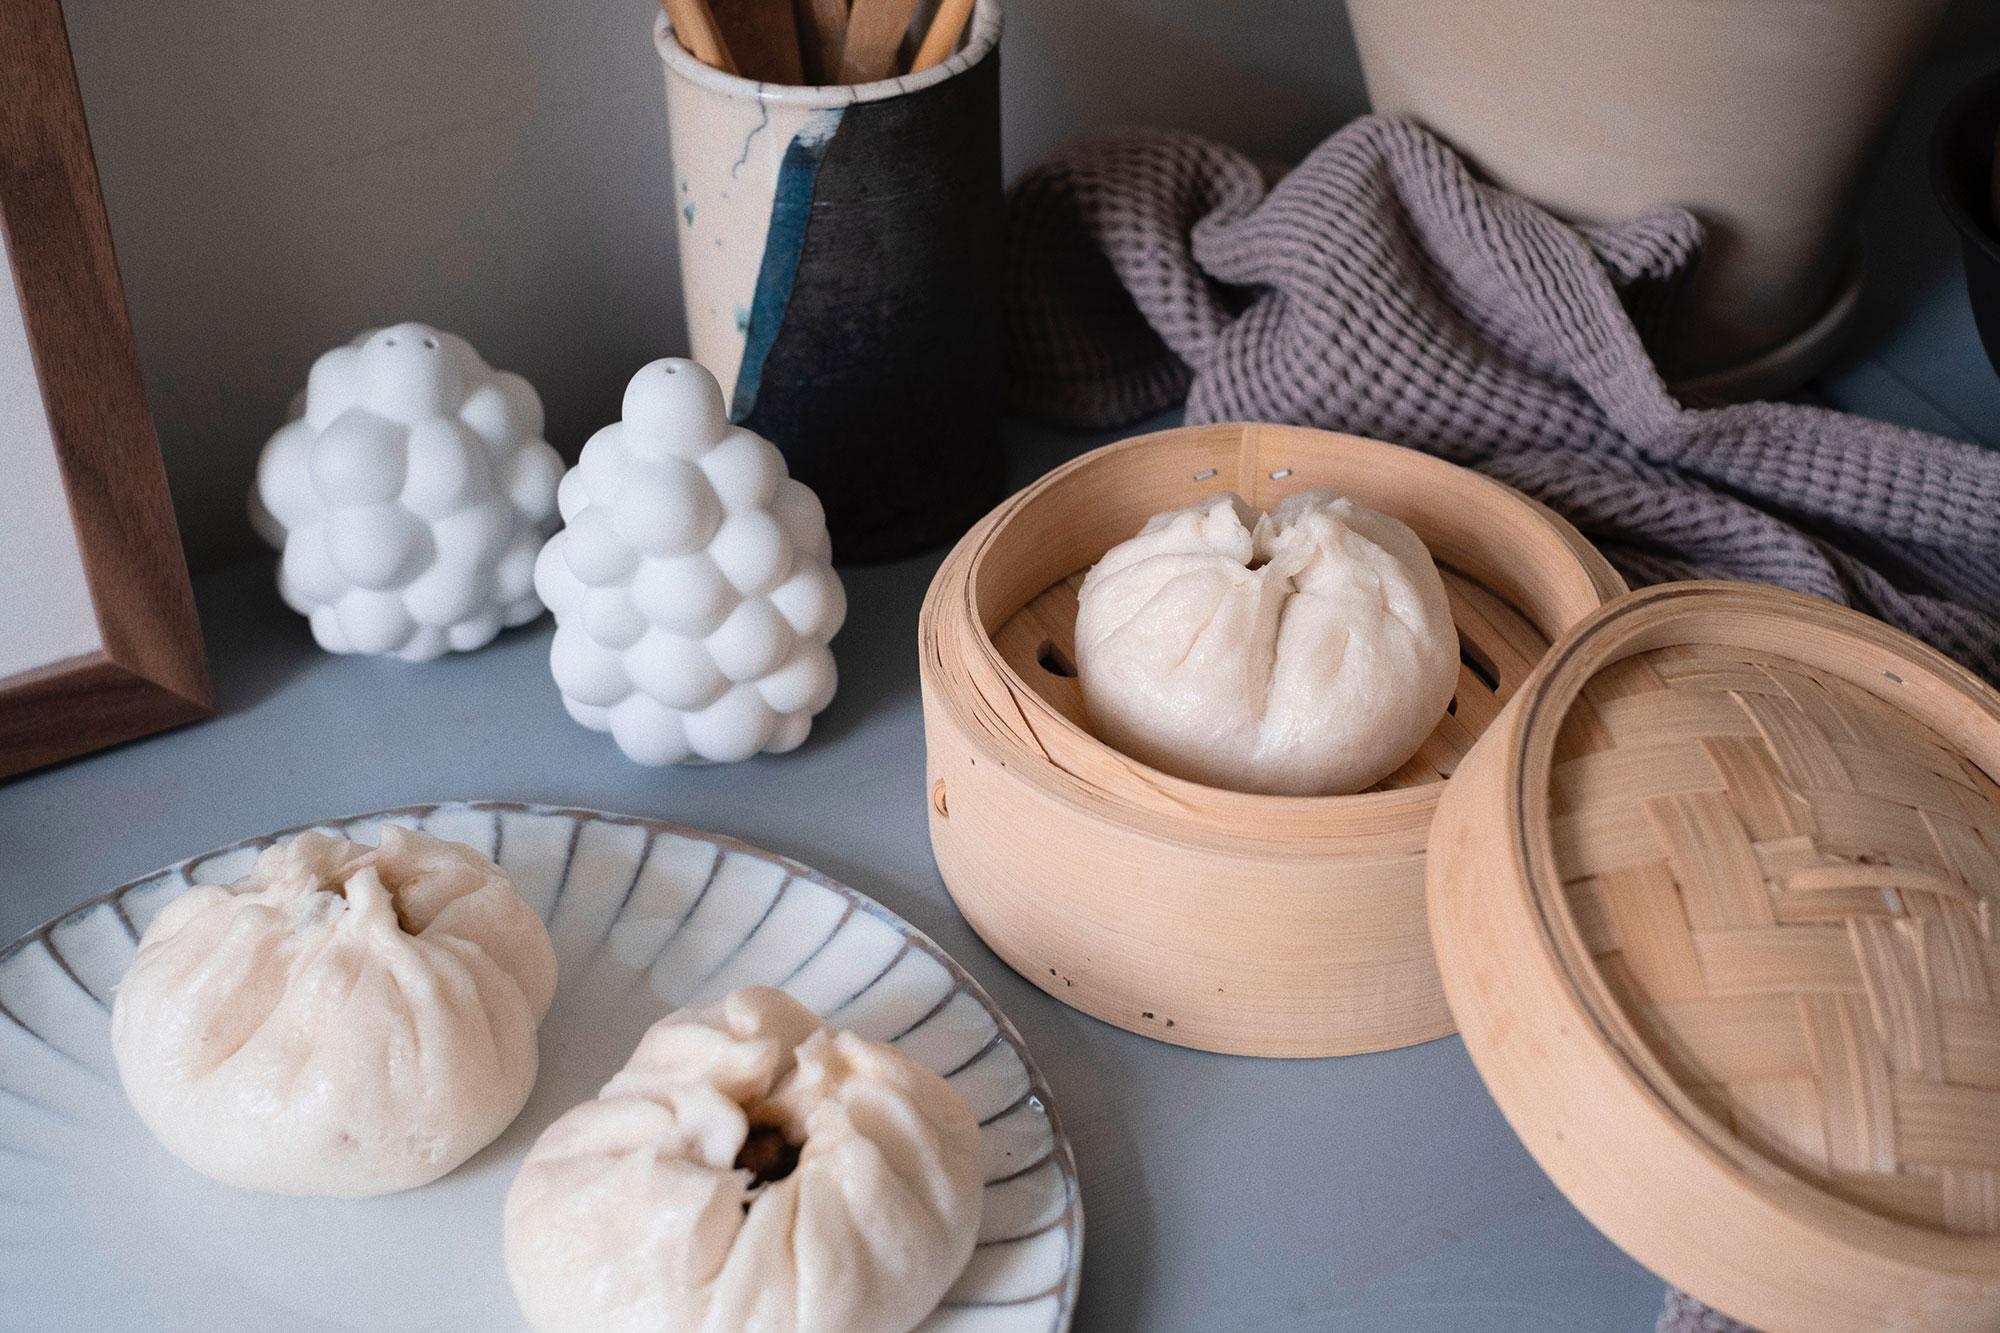 Omas Bánh Bao Xá Xíu Rezept / Char Siu Bao - Steamed BBQ Pork Buns (叉烧包) / Recipe by Alice M. Huynh on iHeartAlice.com – German Travel, Fashion, Lifestyle & Foodblog